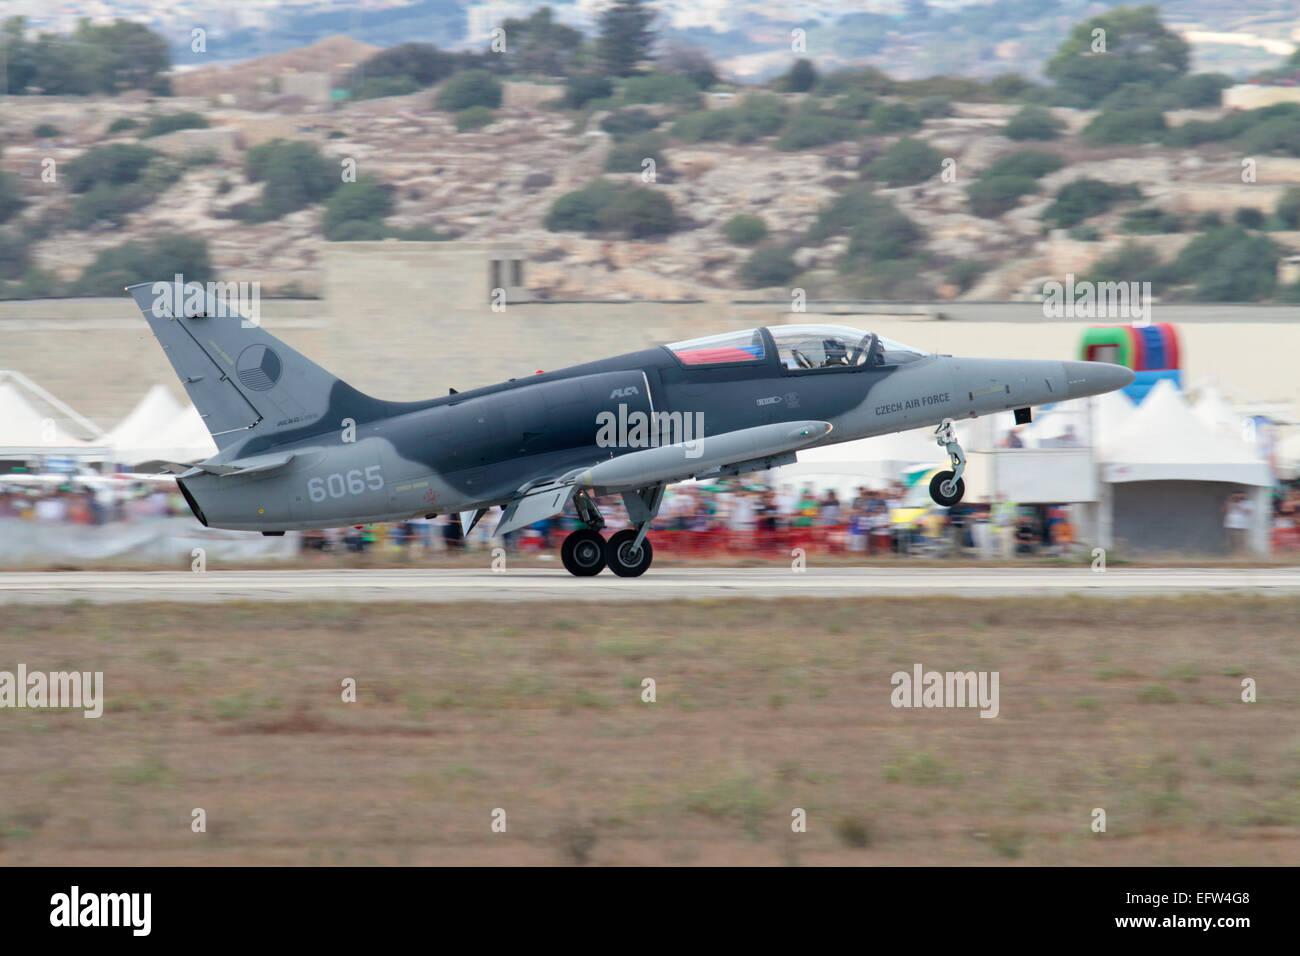 Aero L-159 ALCA (advanced light combat aircraft) landing after a display in Malta Stock Photo